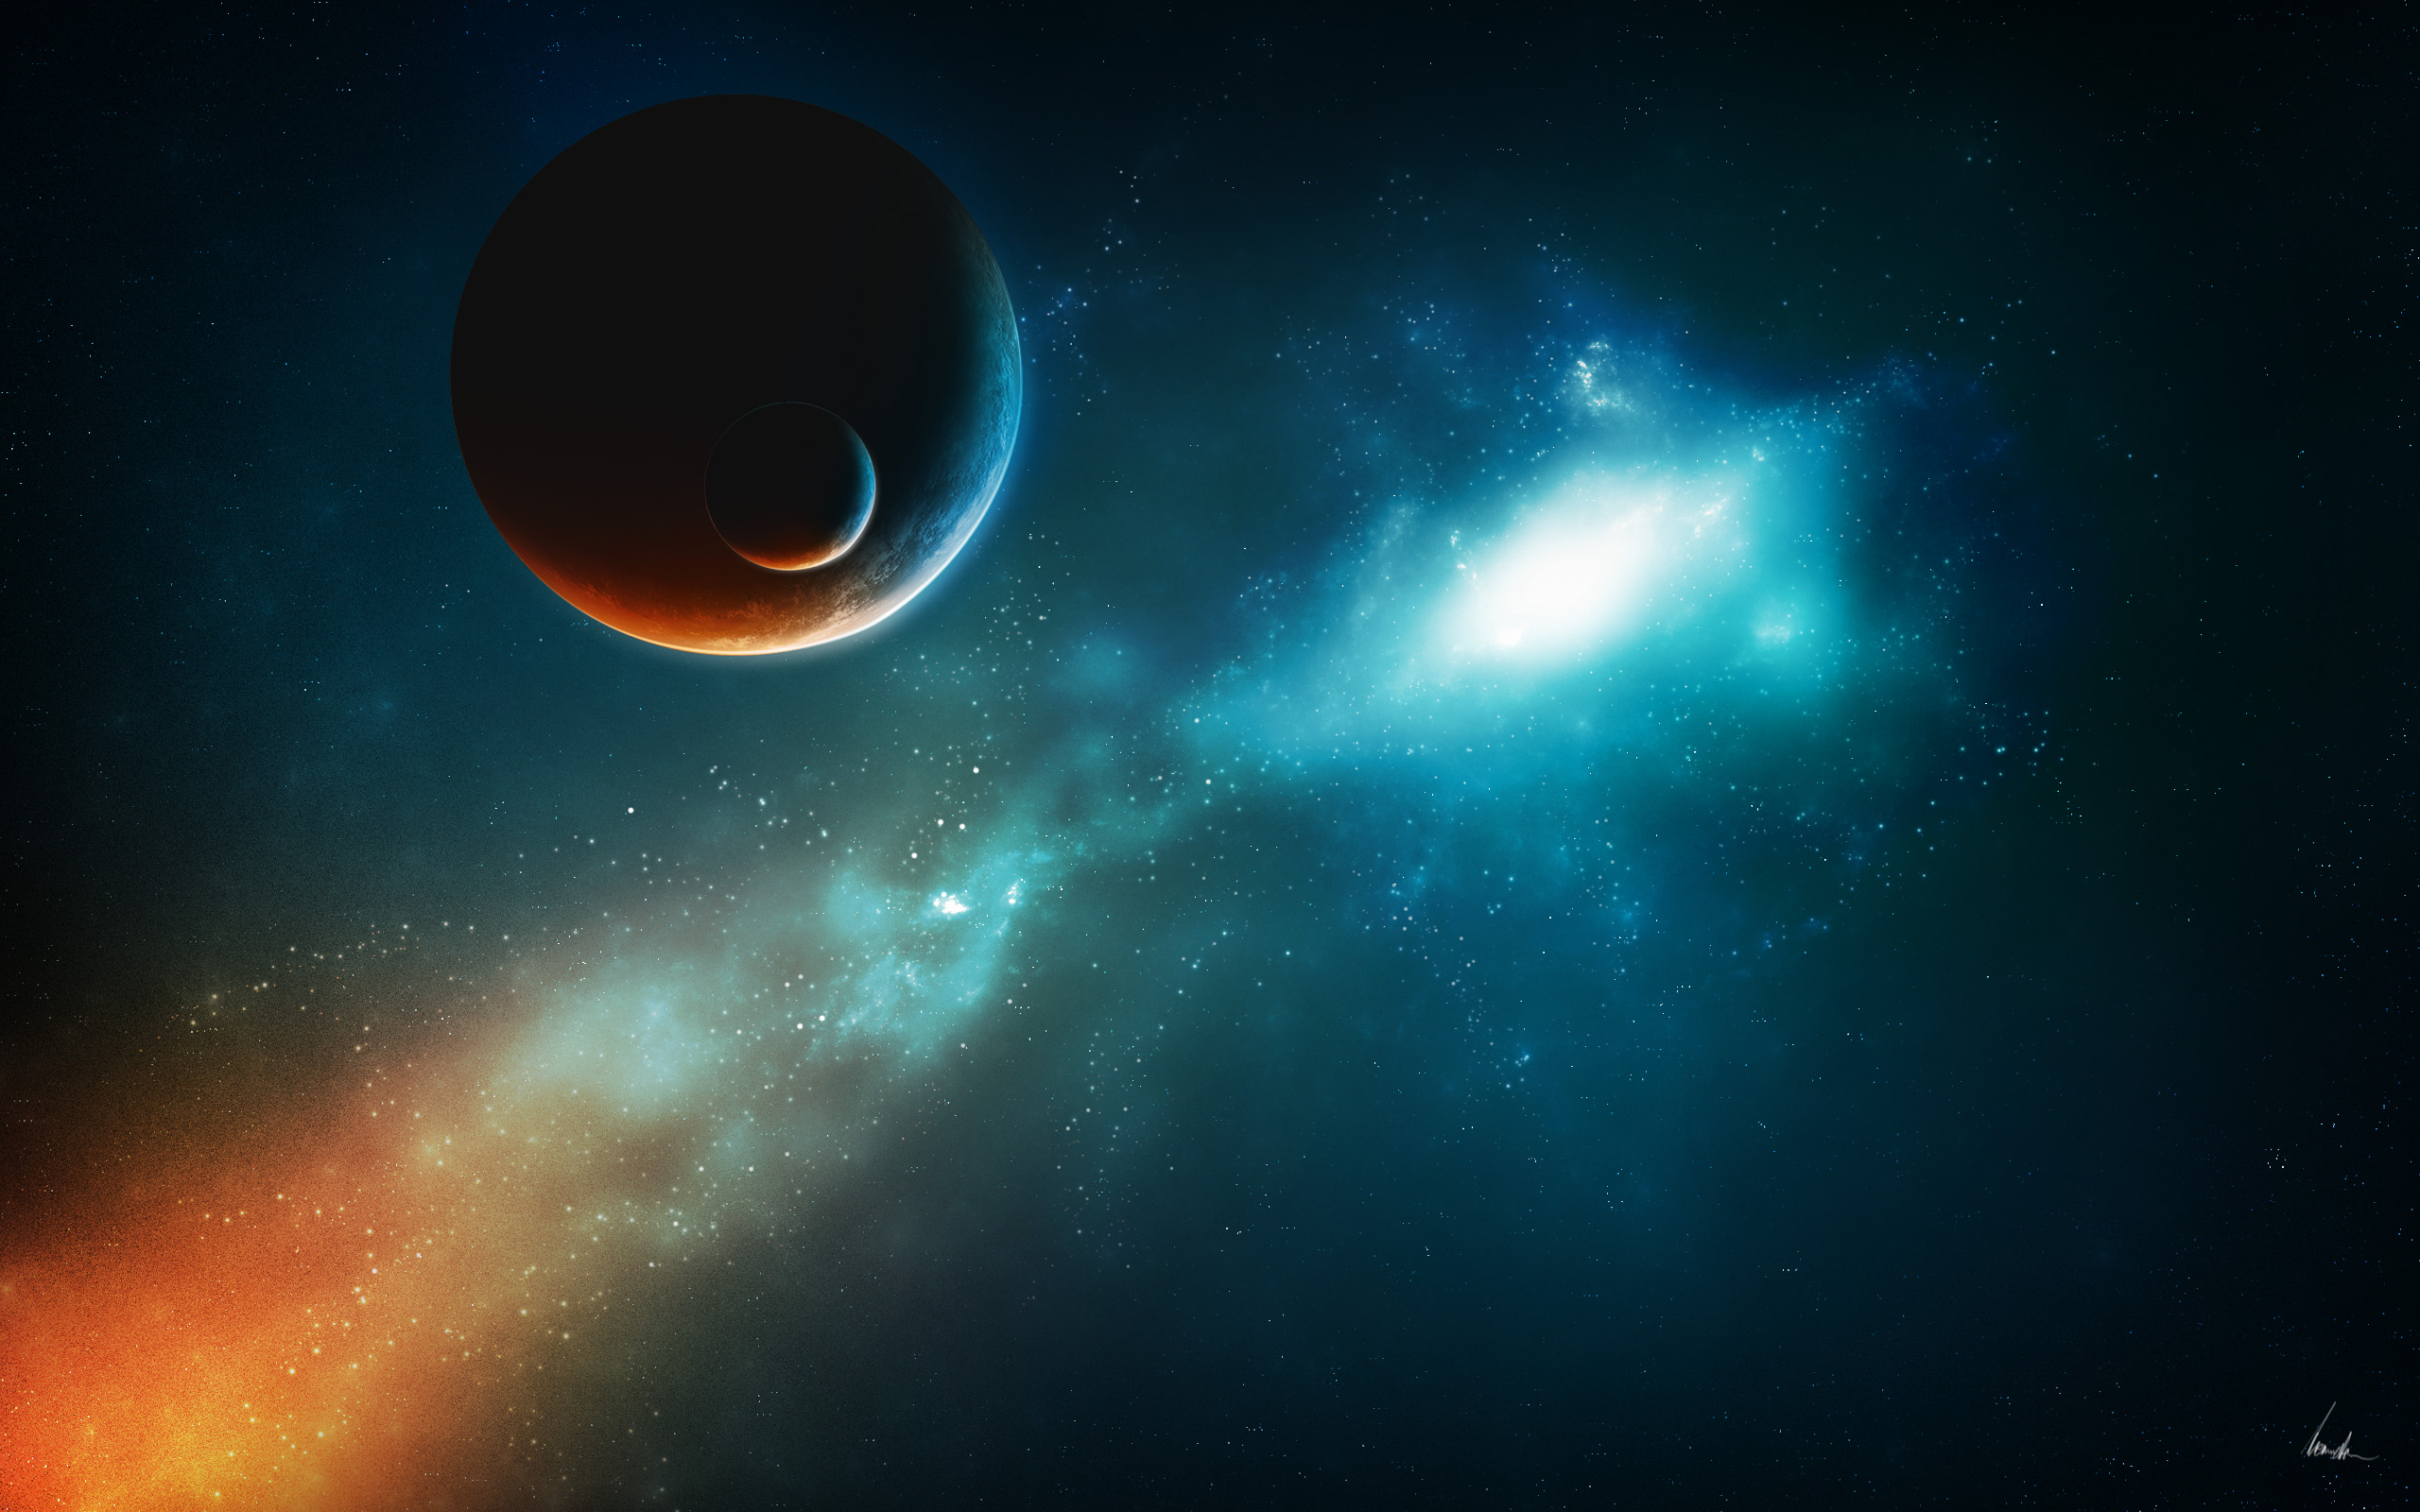 Beautiful Universe Wallpapers HD Wallpapers 2560x1600